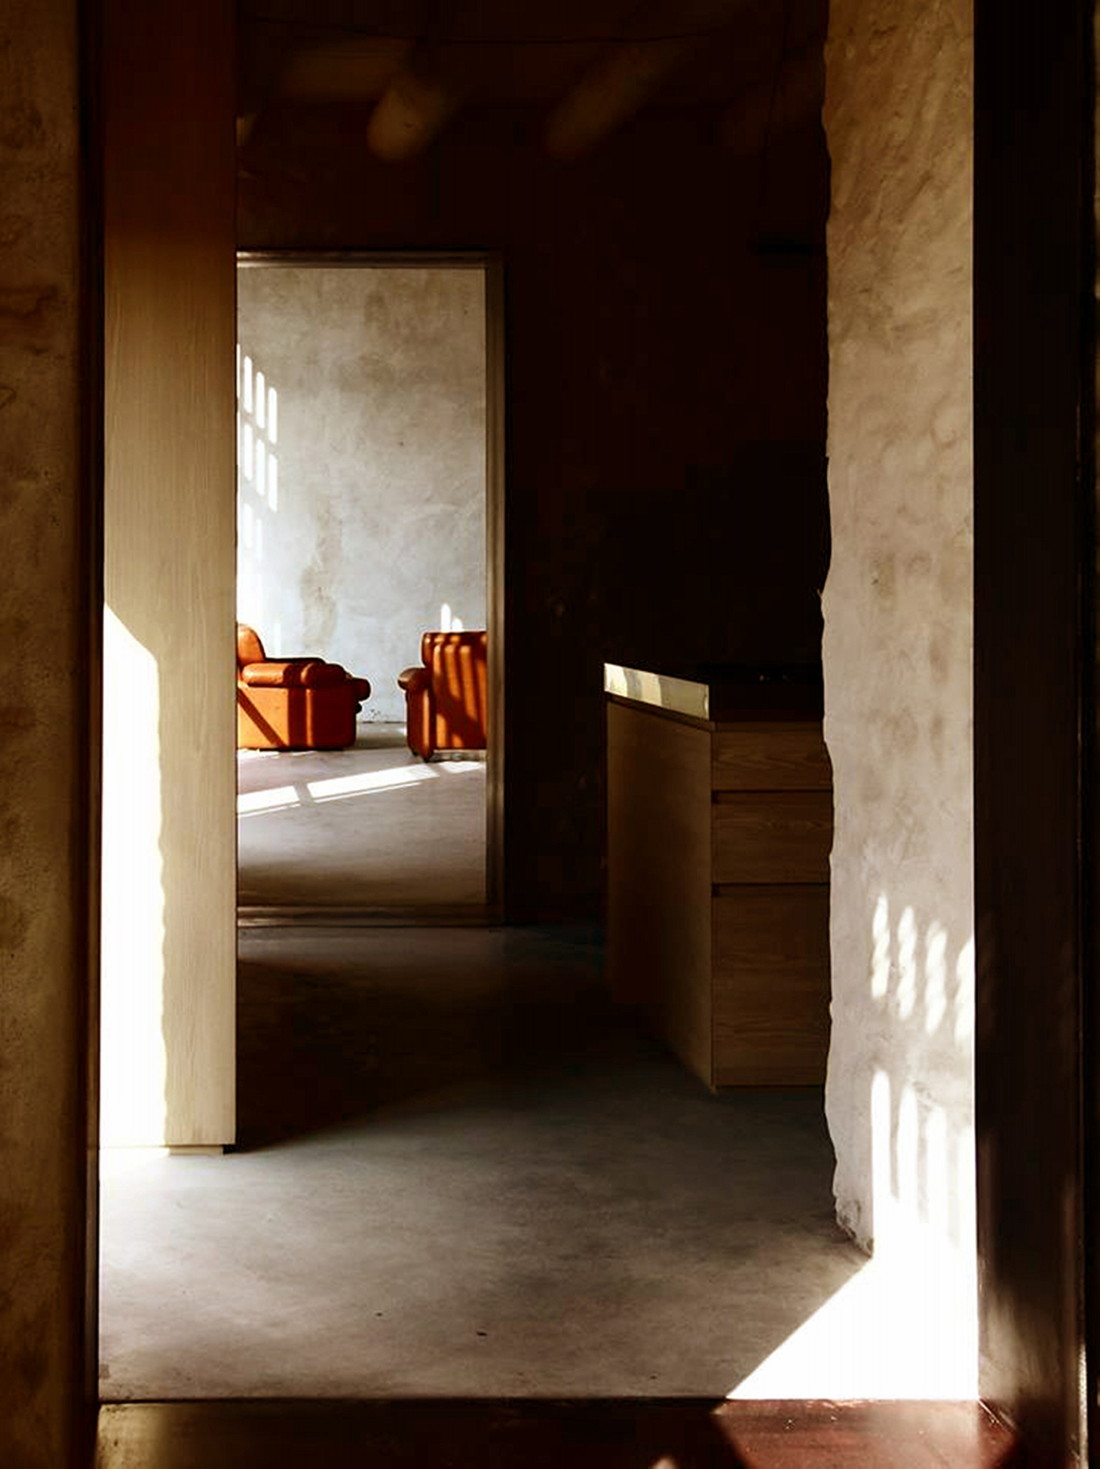 Реставрация виллы Brolo Saccomani в Италии от студии Bricolo Falsarella 9